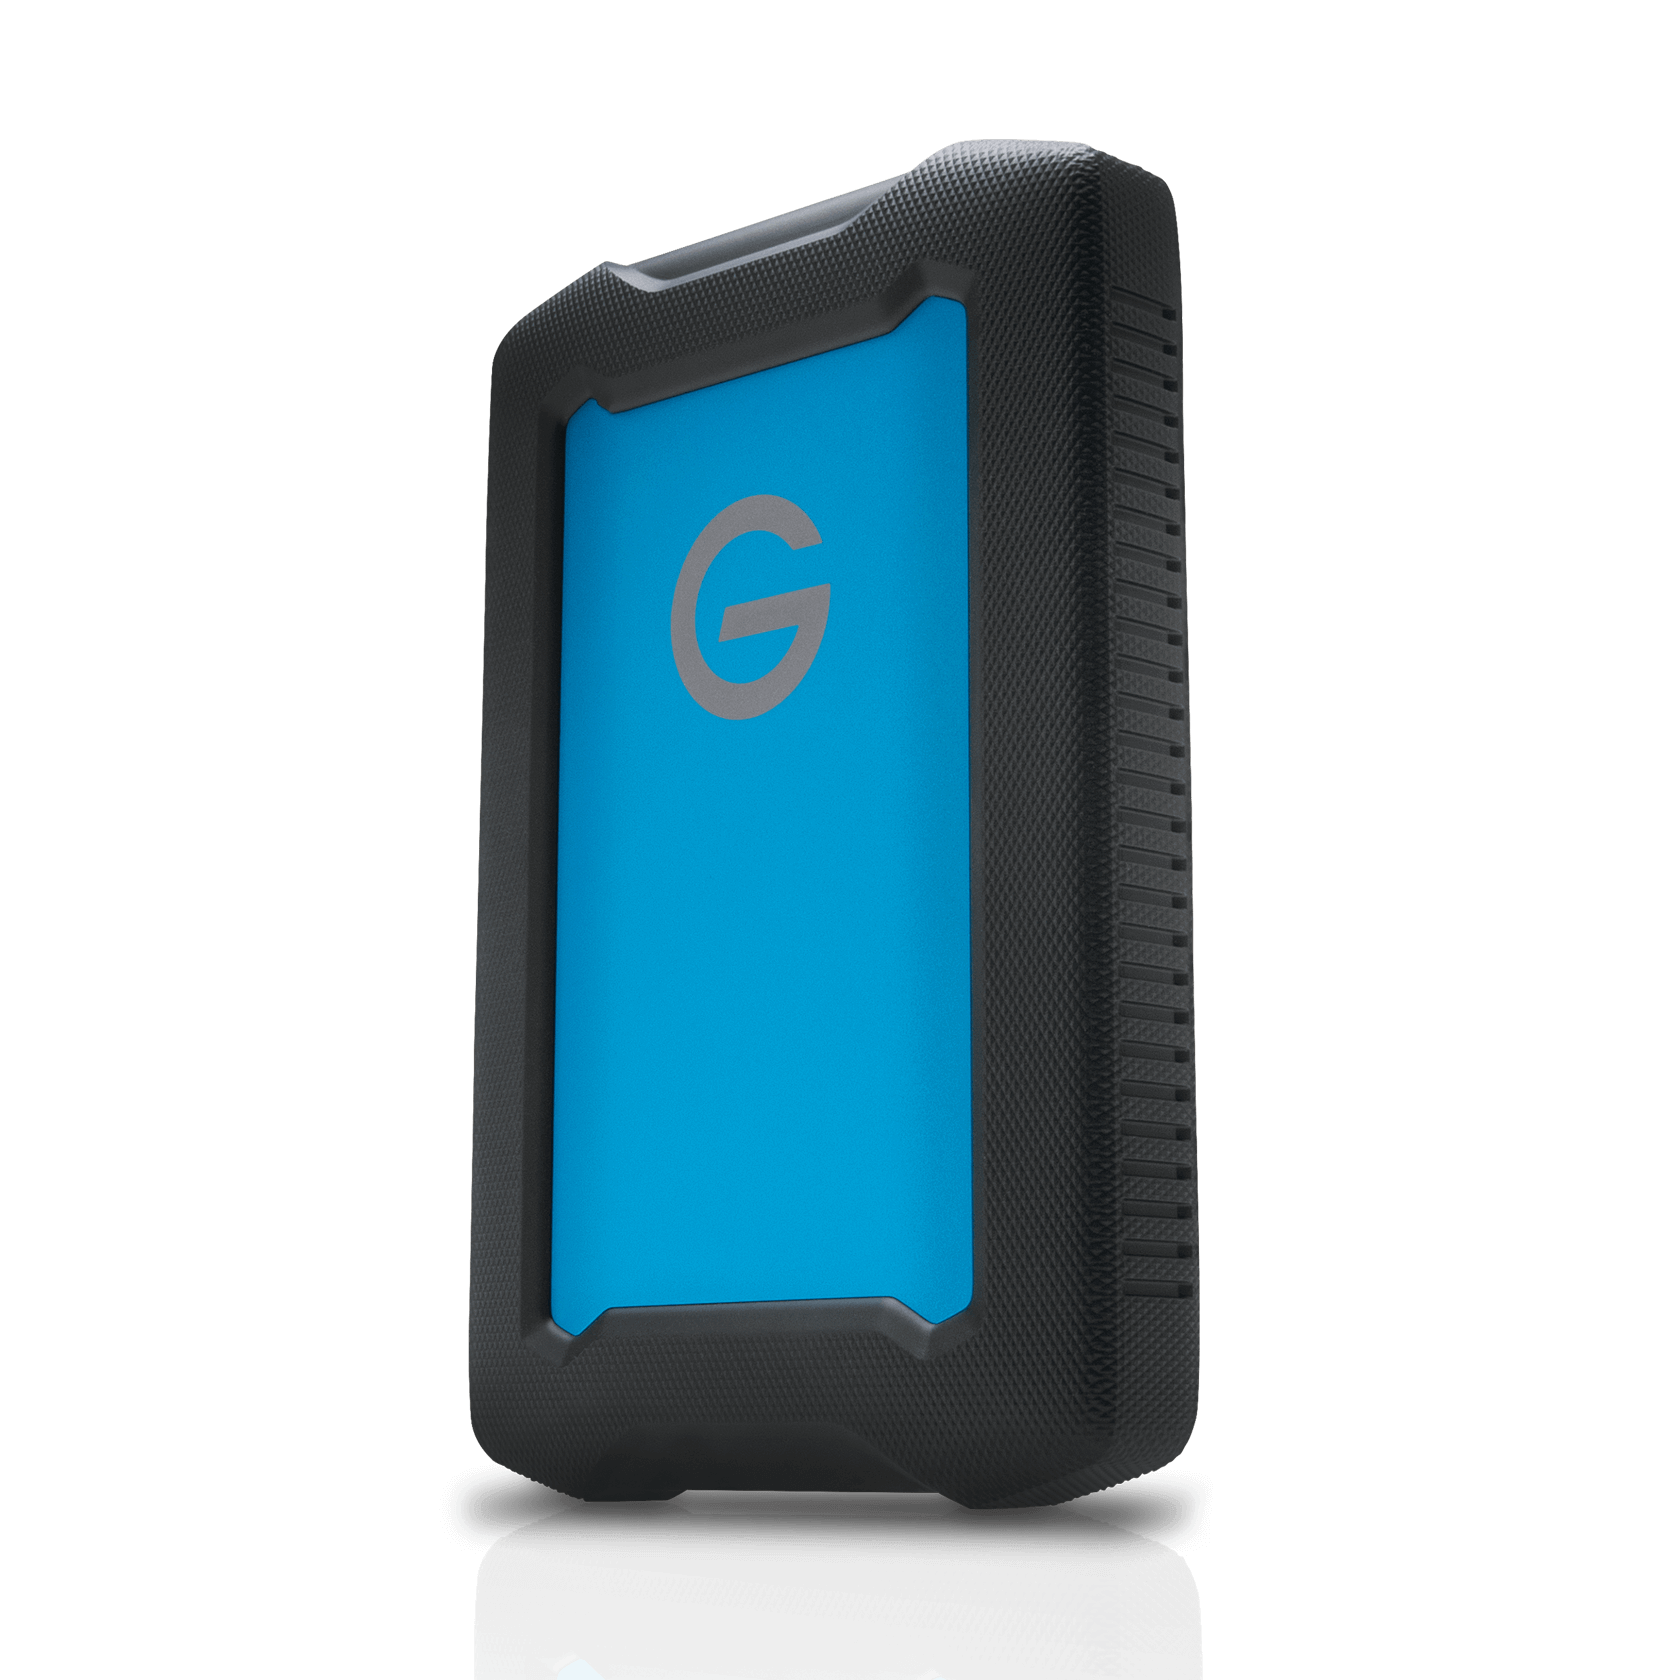 WesternDigital coupon: G-Technology 1TB ArmorATD - 0G10433-1